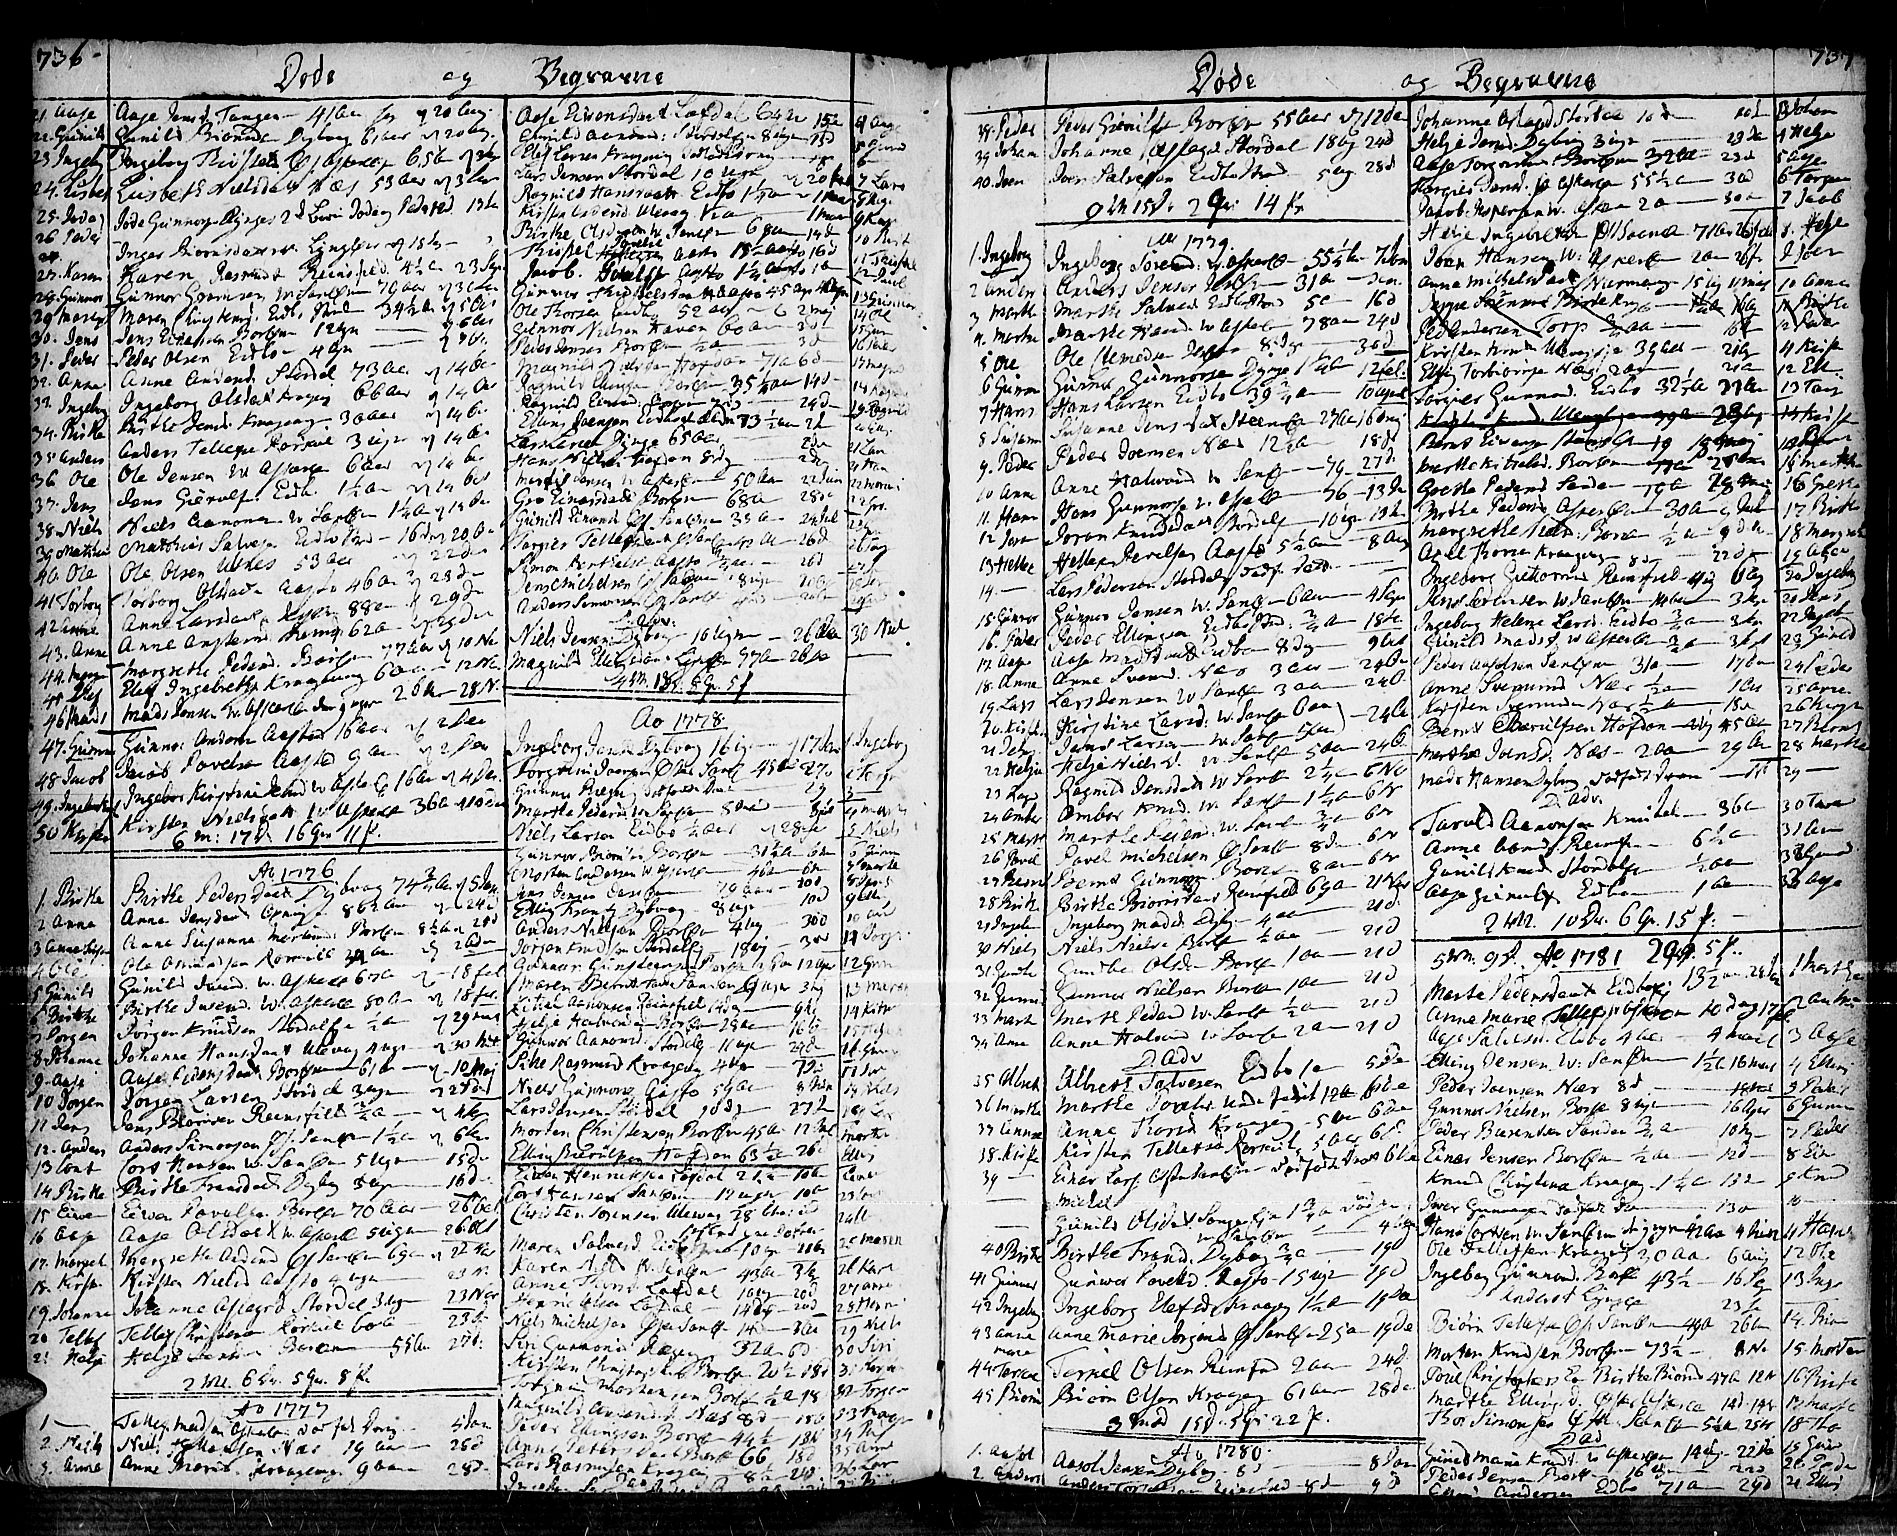 SAK, Dypvåg sokneprestkontor, F/Fa/Faa/L0001: Ministerialbok nr. A 1 /1, 1765-1798, s. 736-737